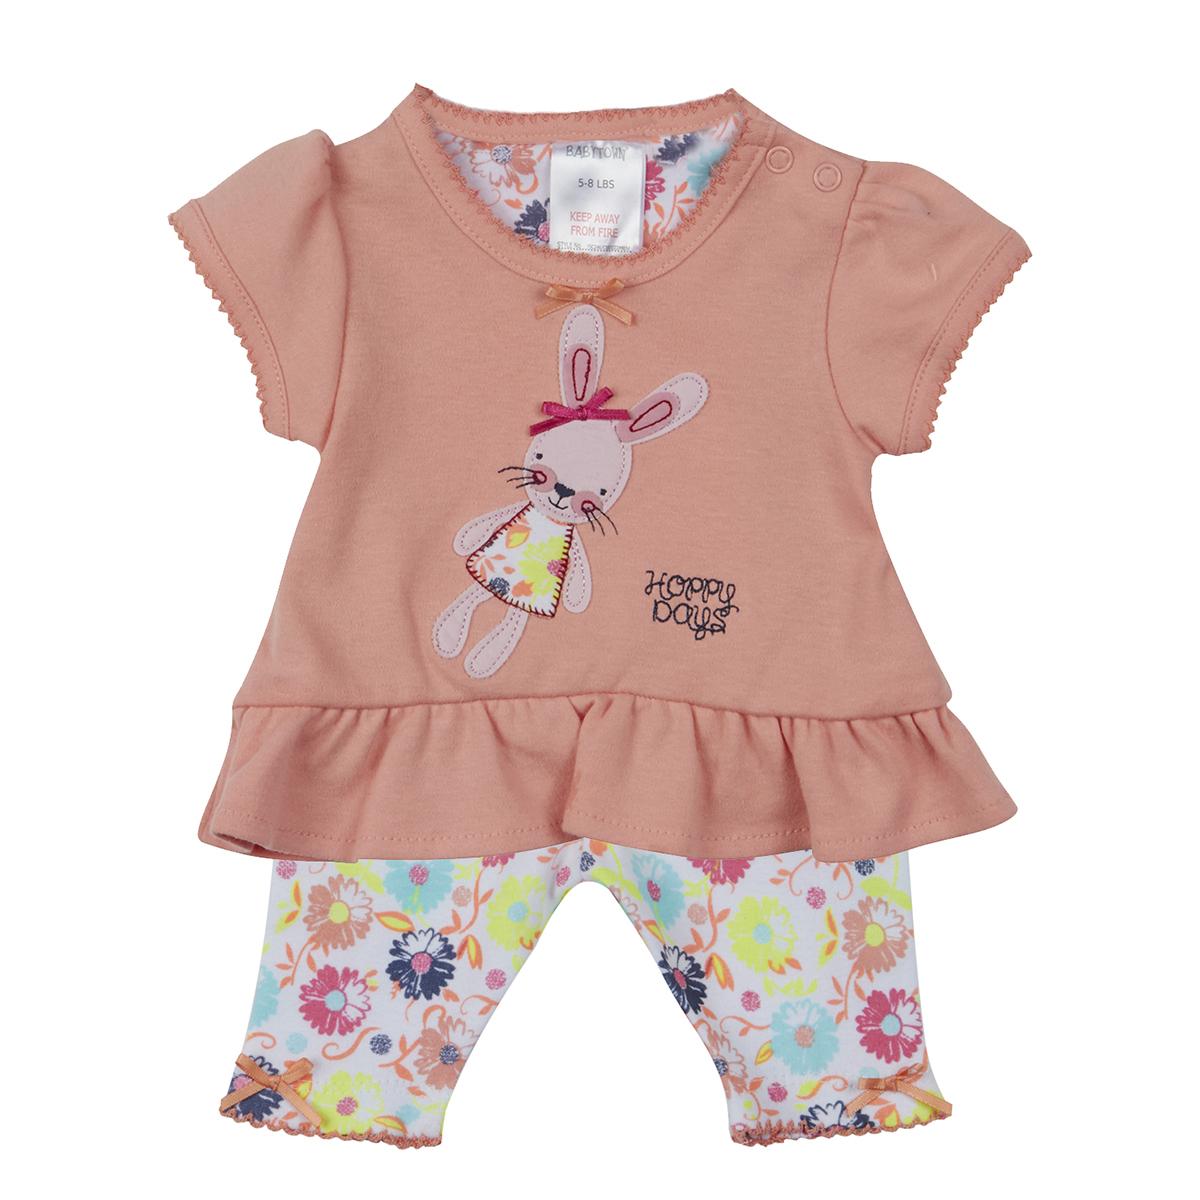 BABYTOWN Premature Baby Girls Novelty Summer Clothes T-Shirt /& Leggings Set